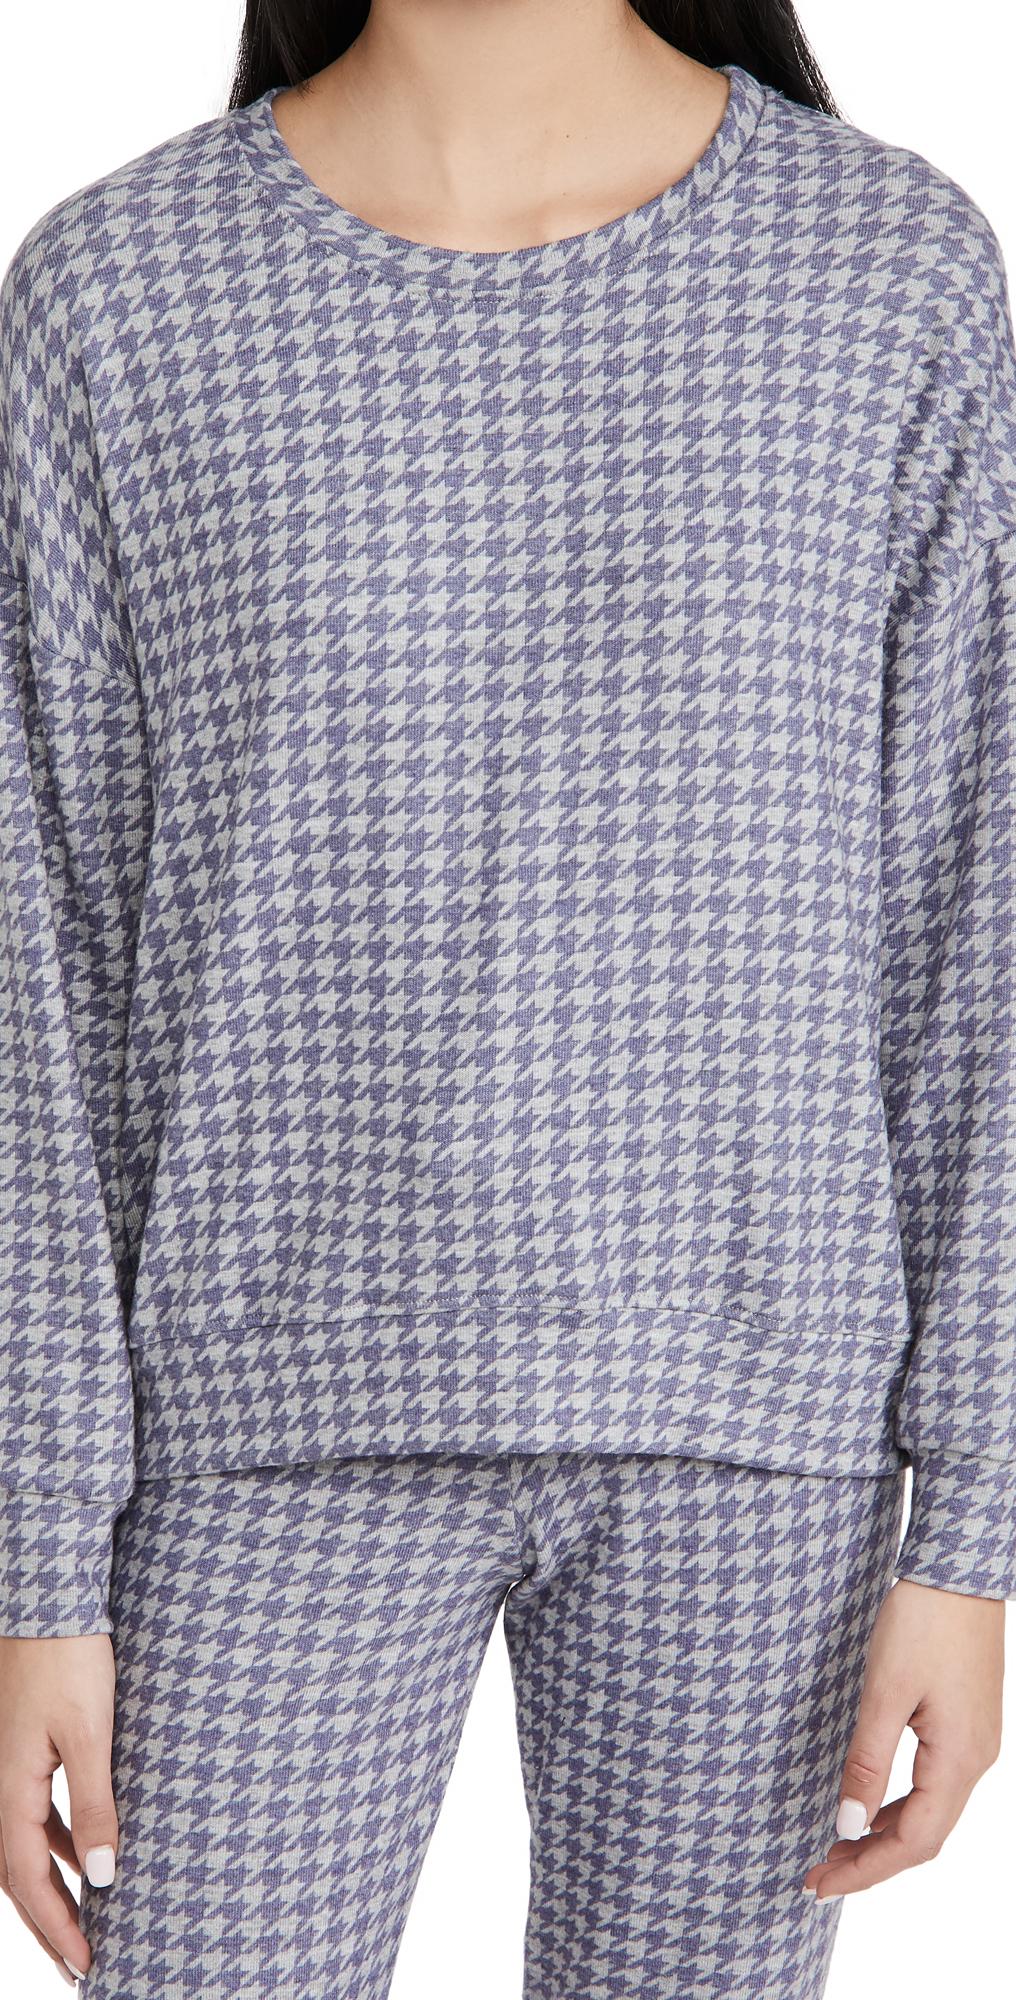 Sundry Sweatshirts HOUNDSTOOTH SWEATSHIRT